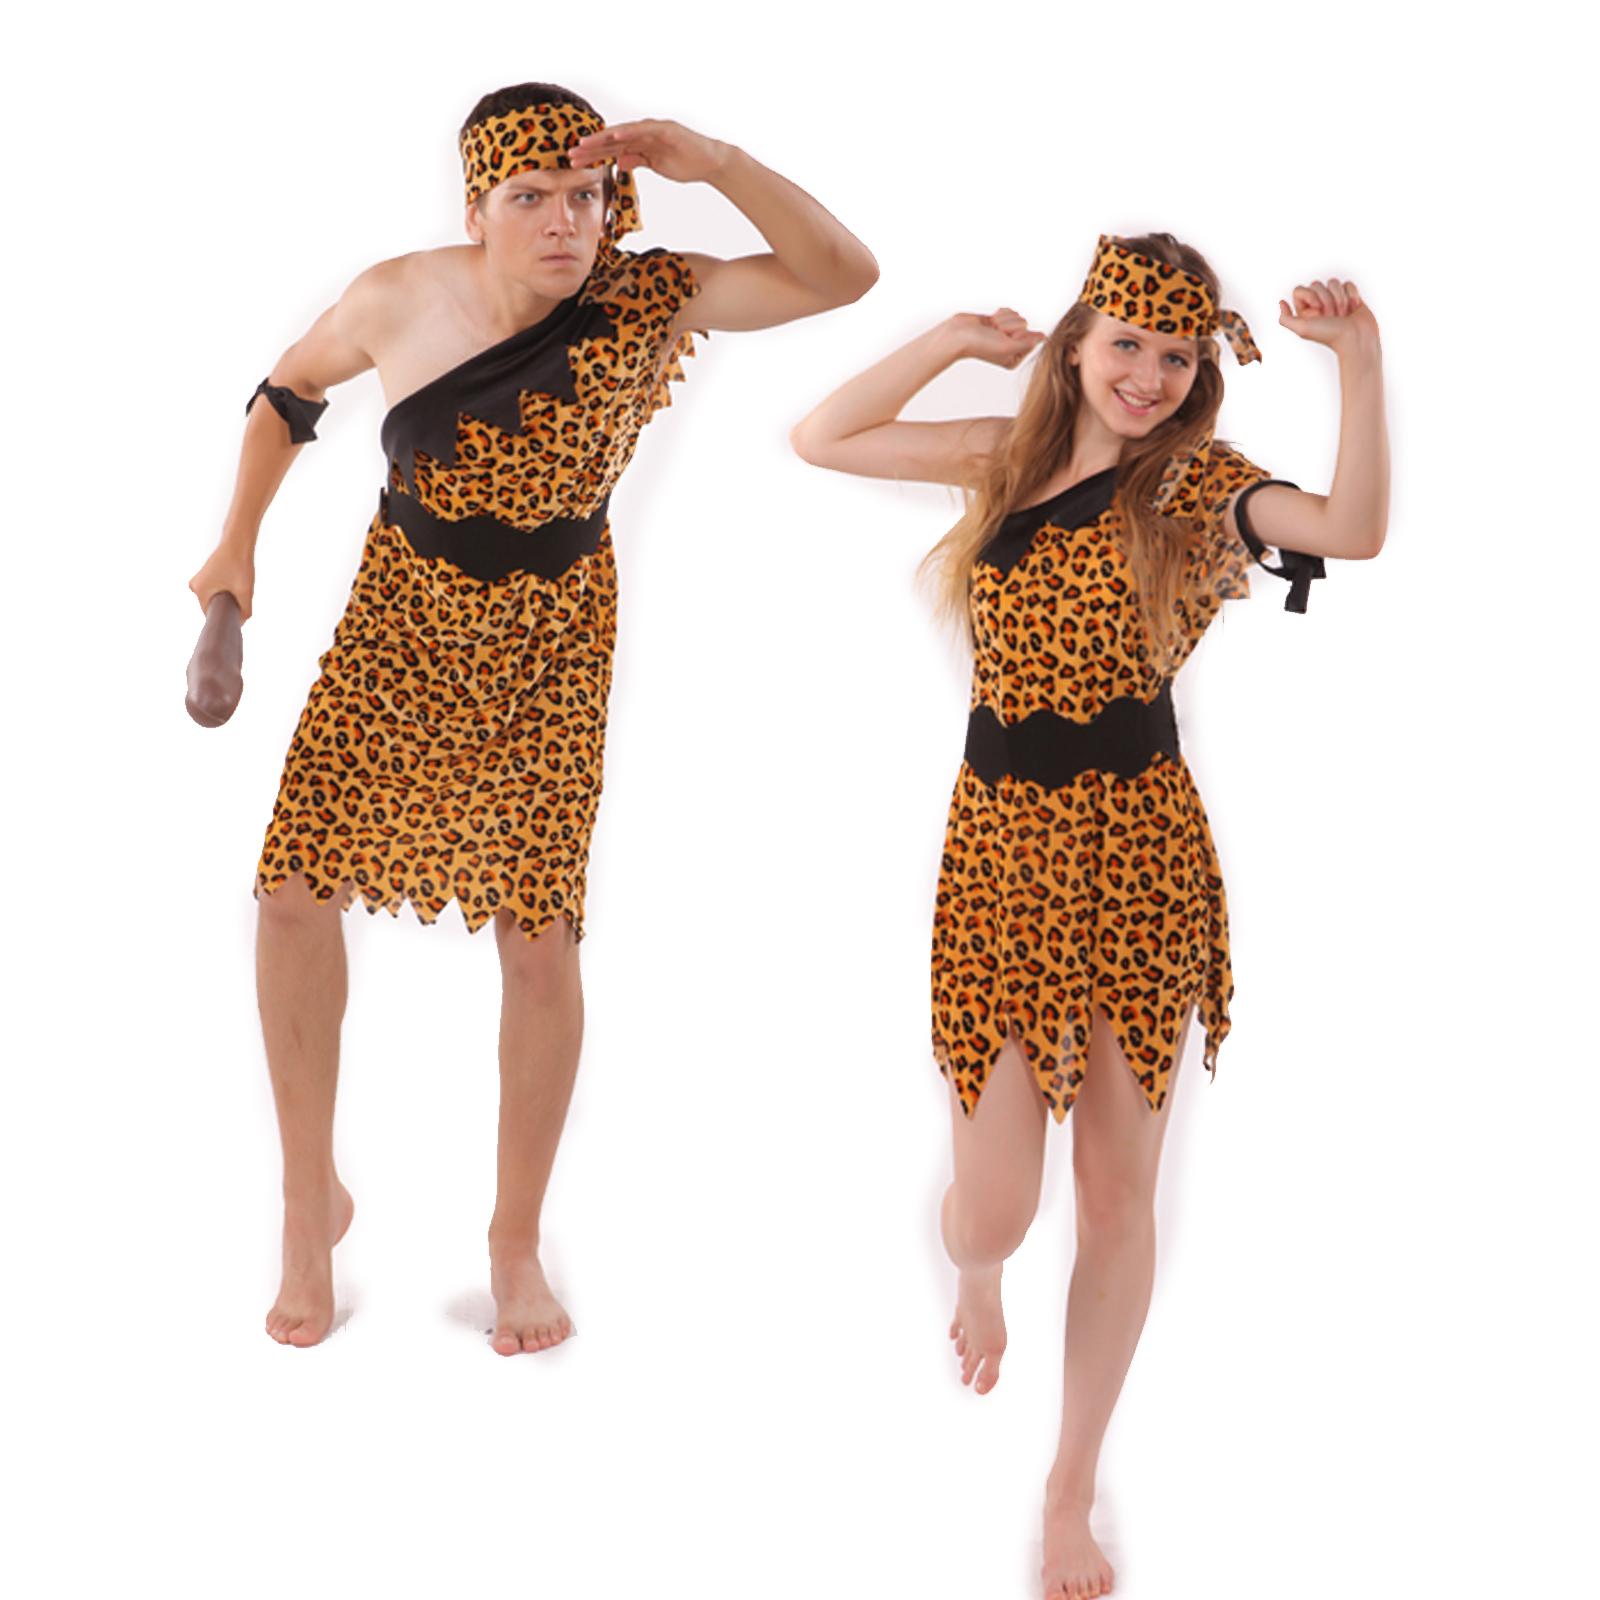 Caveman Style : Funny stoneage flintstones jungle caveman cavewoman cave